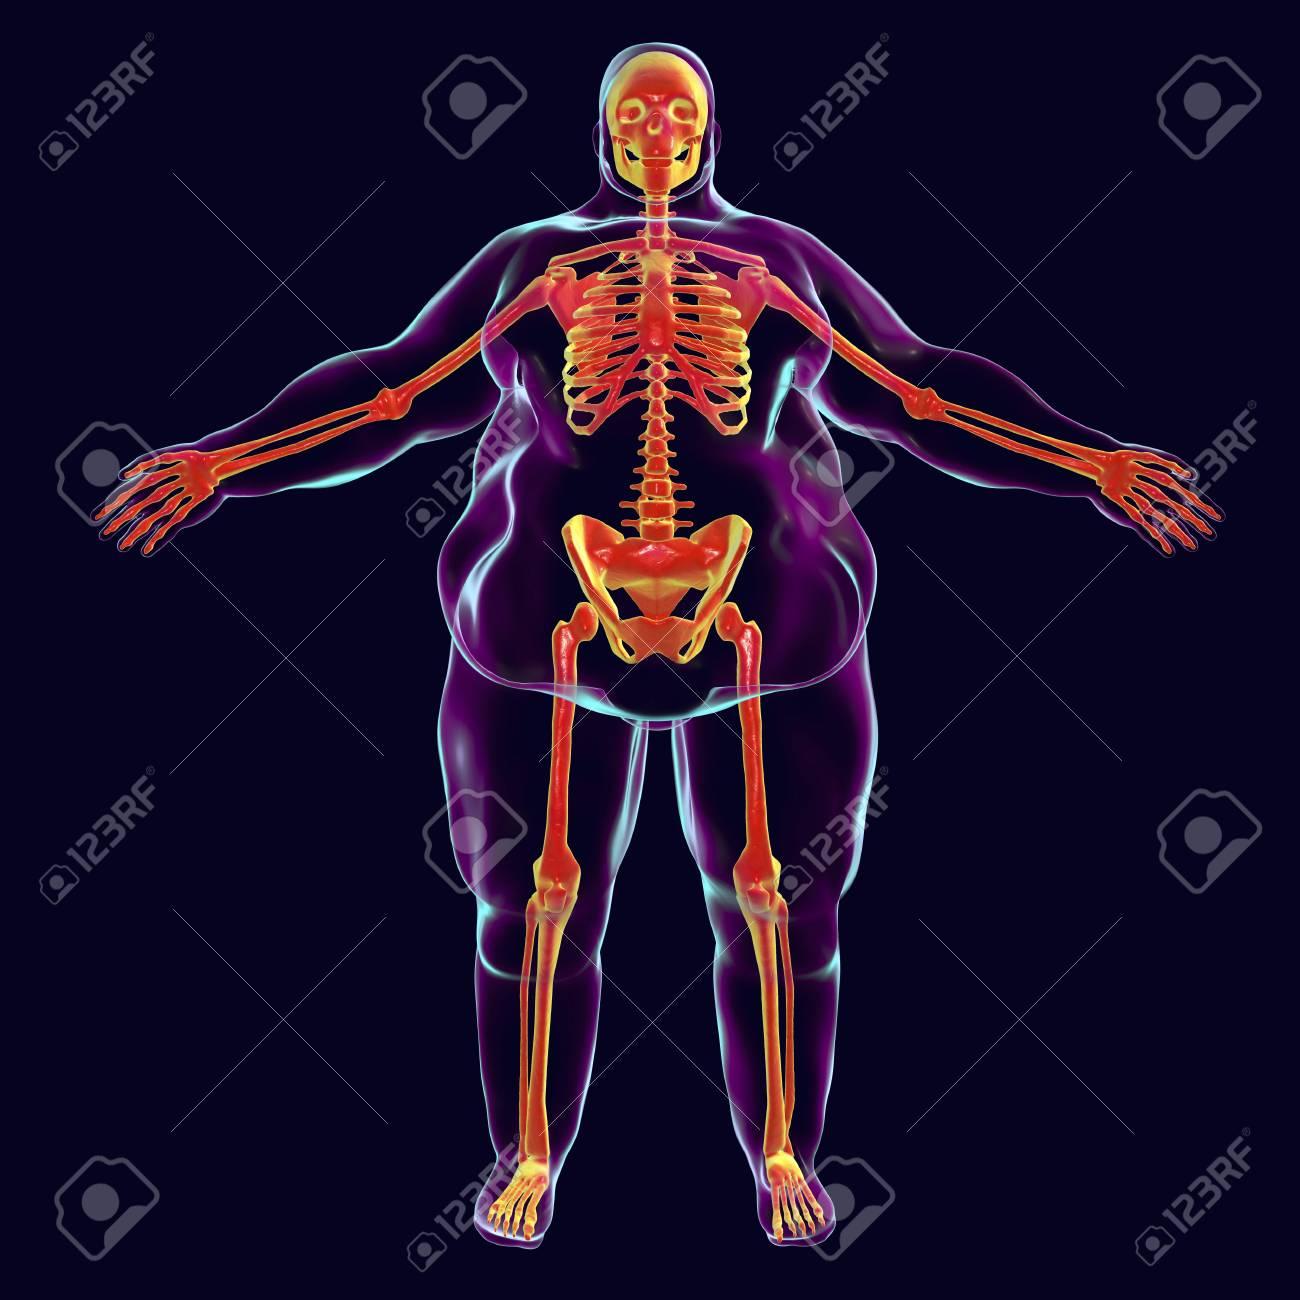 Korpulenzproblem-Begriffsbild, Illustration 3D, Die Normales Skelett ...